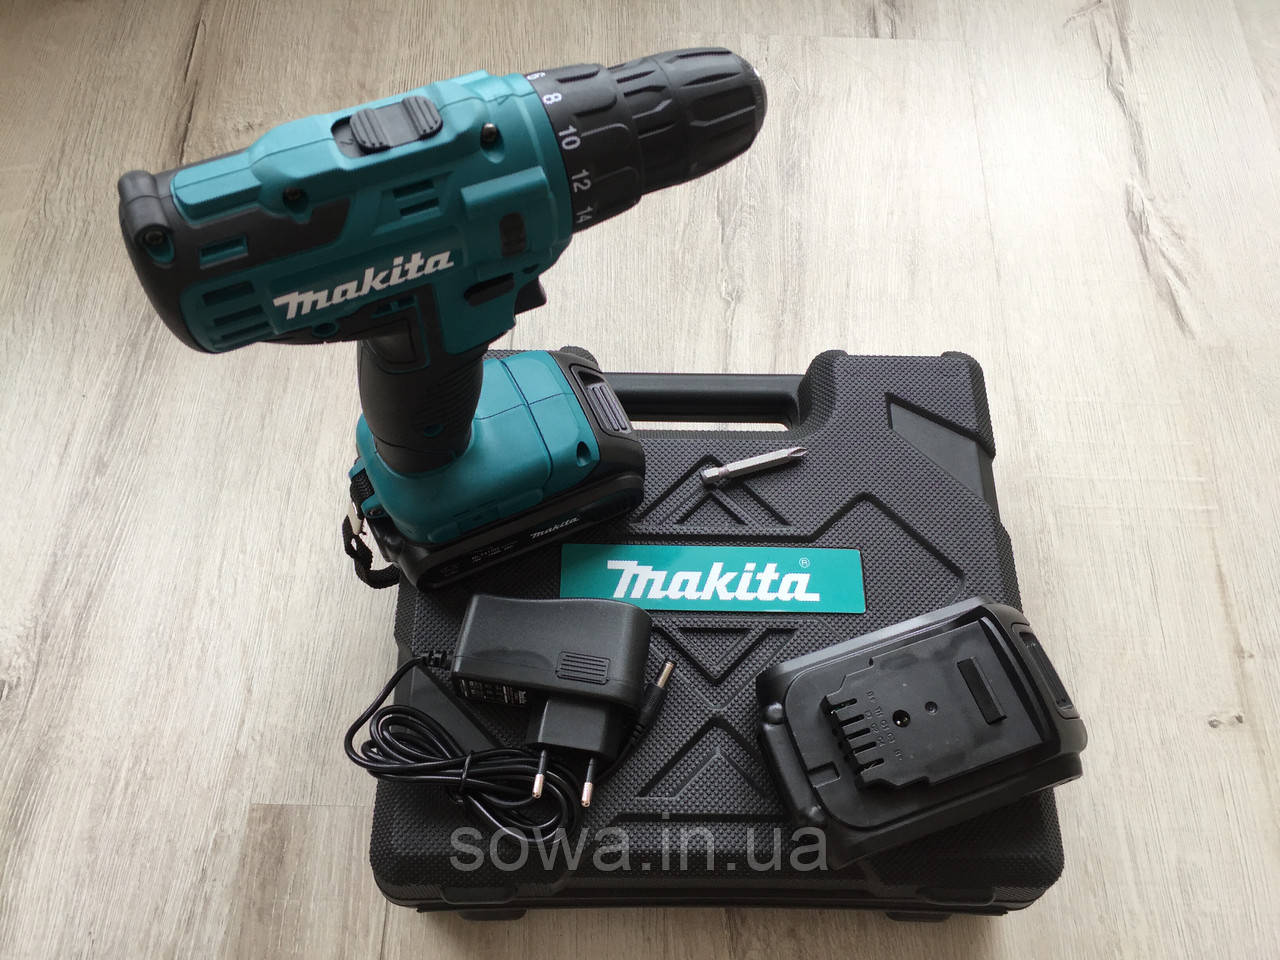 ✔️ Аккумуляторный Шуруповерт Makita DF332D ( 18V : Черный кейс )